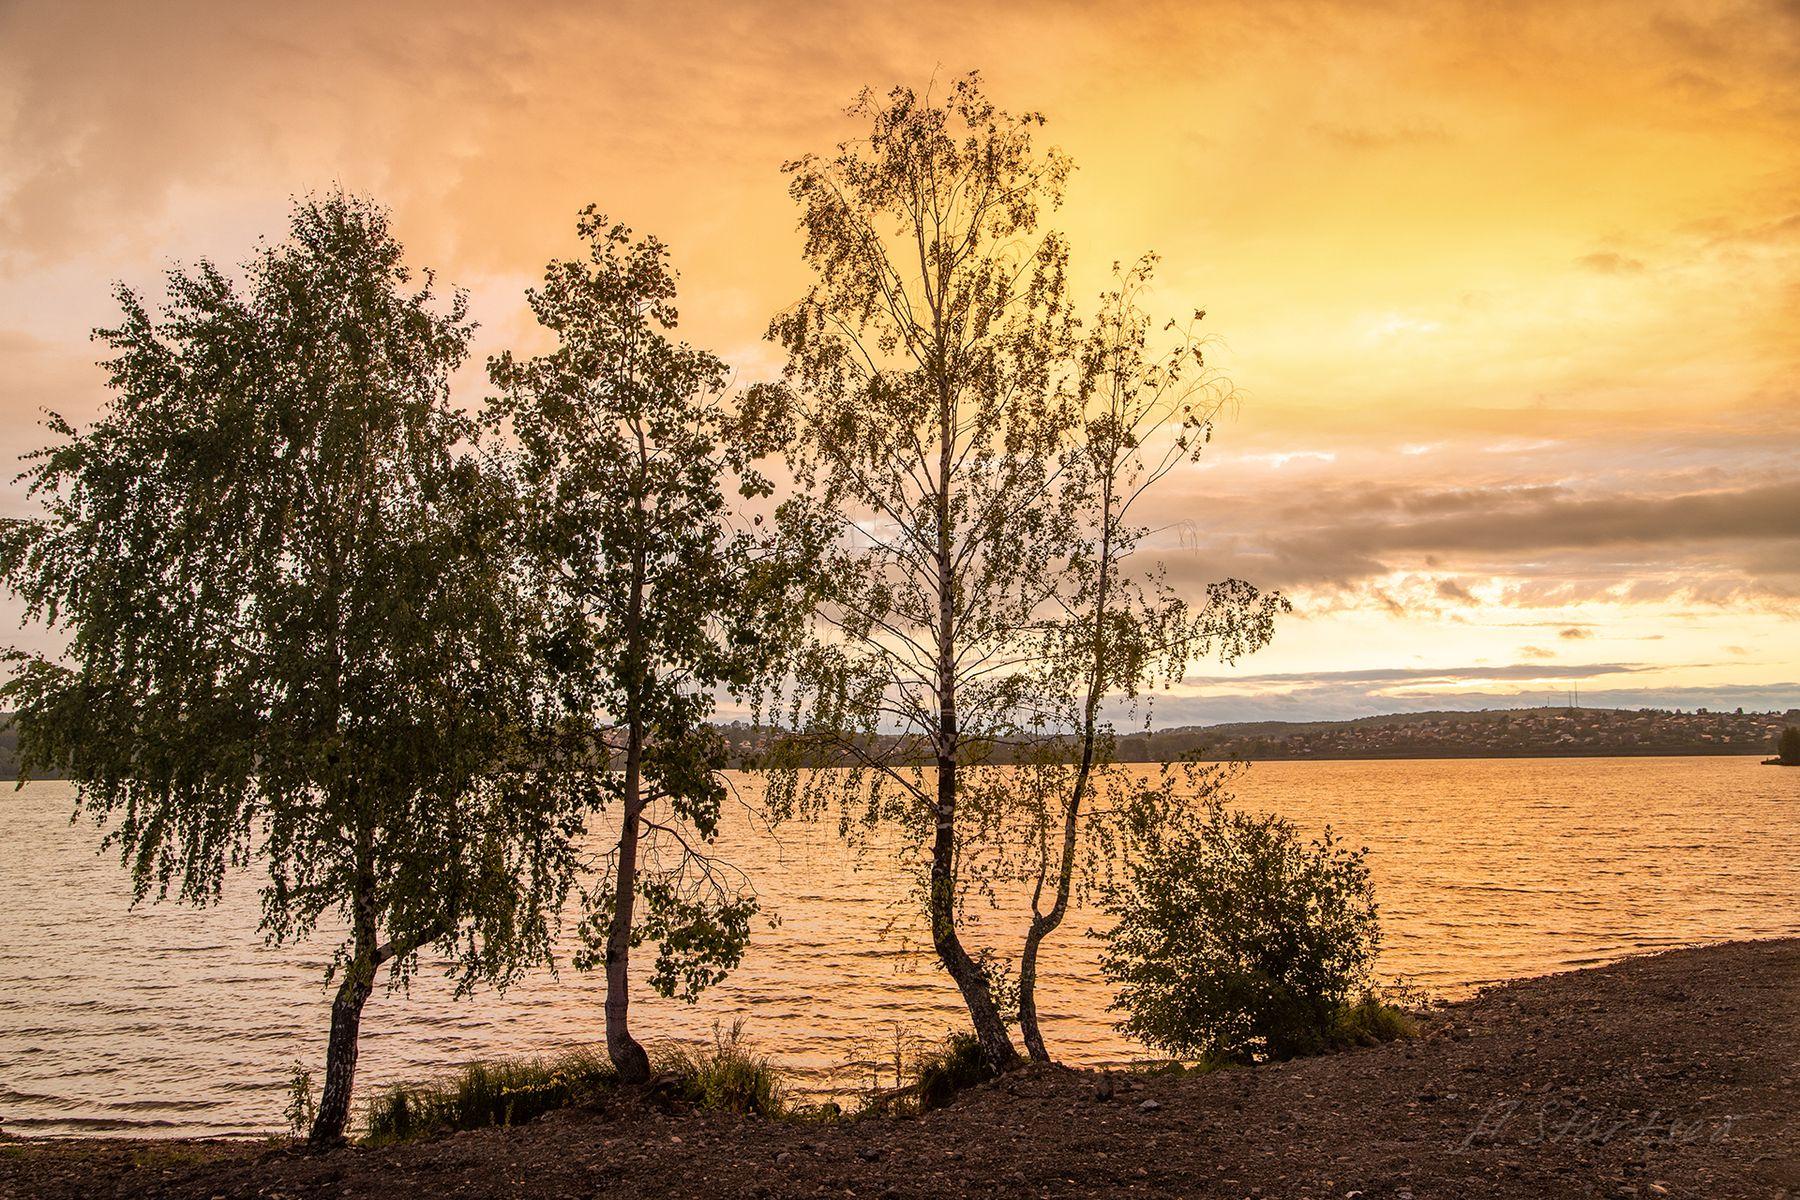 Закат на пруду дерево лето пейзаж природа небо Пермский_край вечер закат